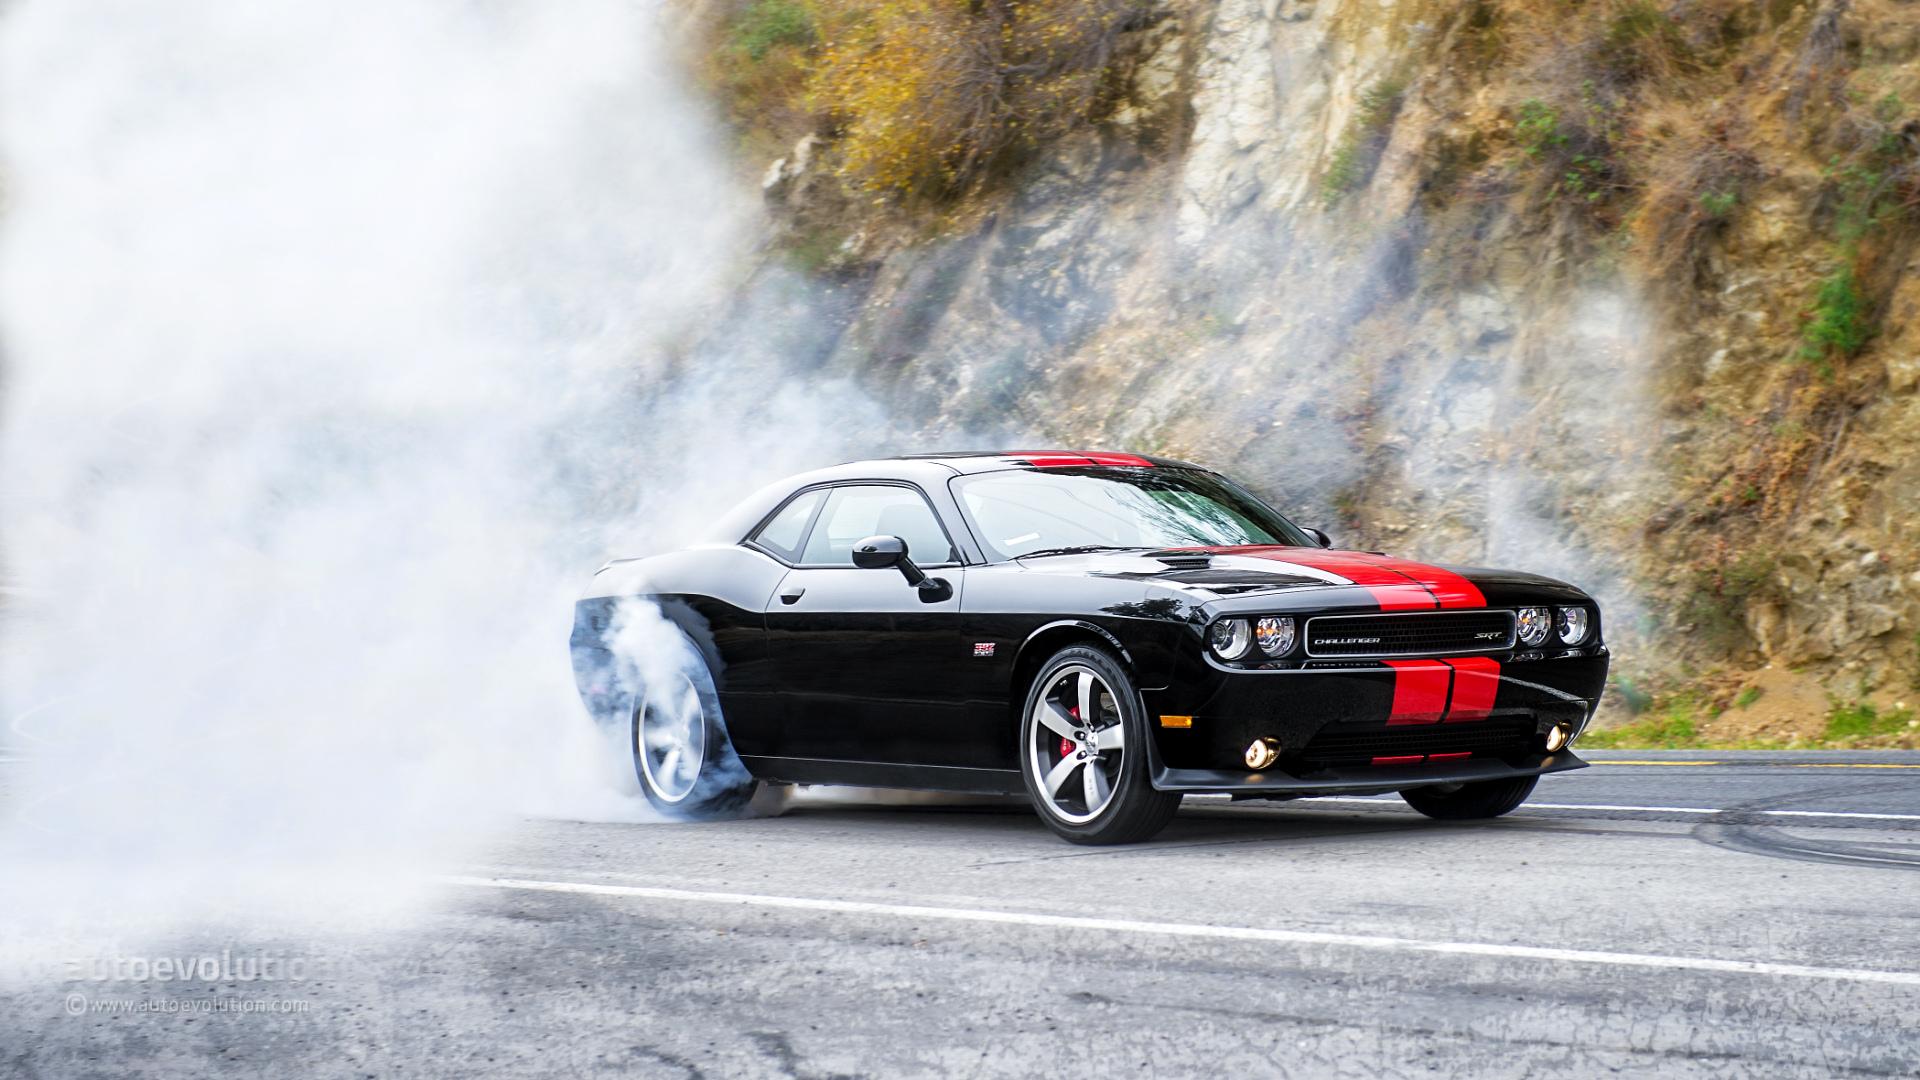 Drifting Cars Hd Wallpapers